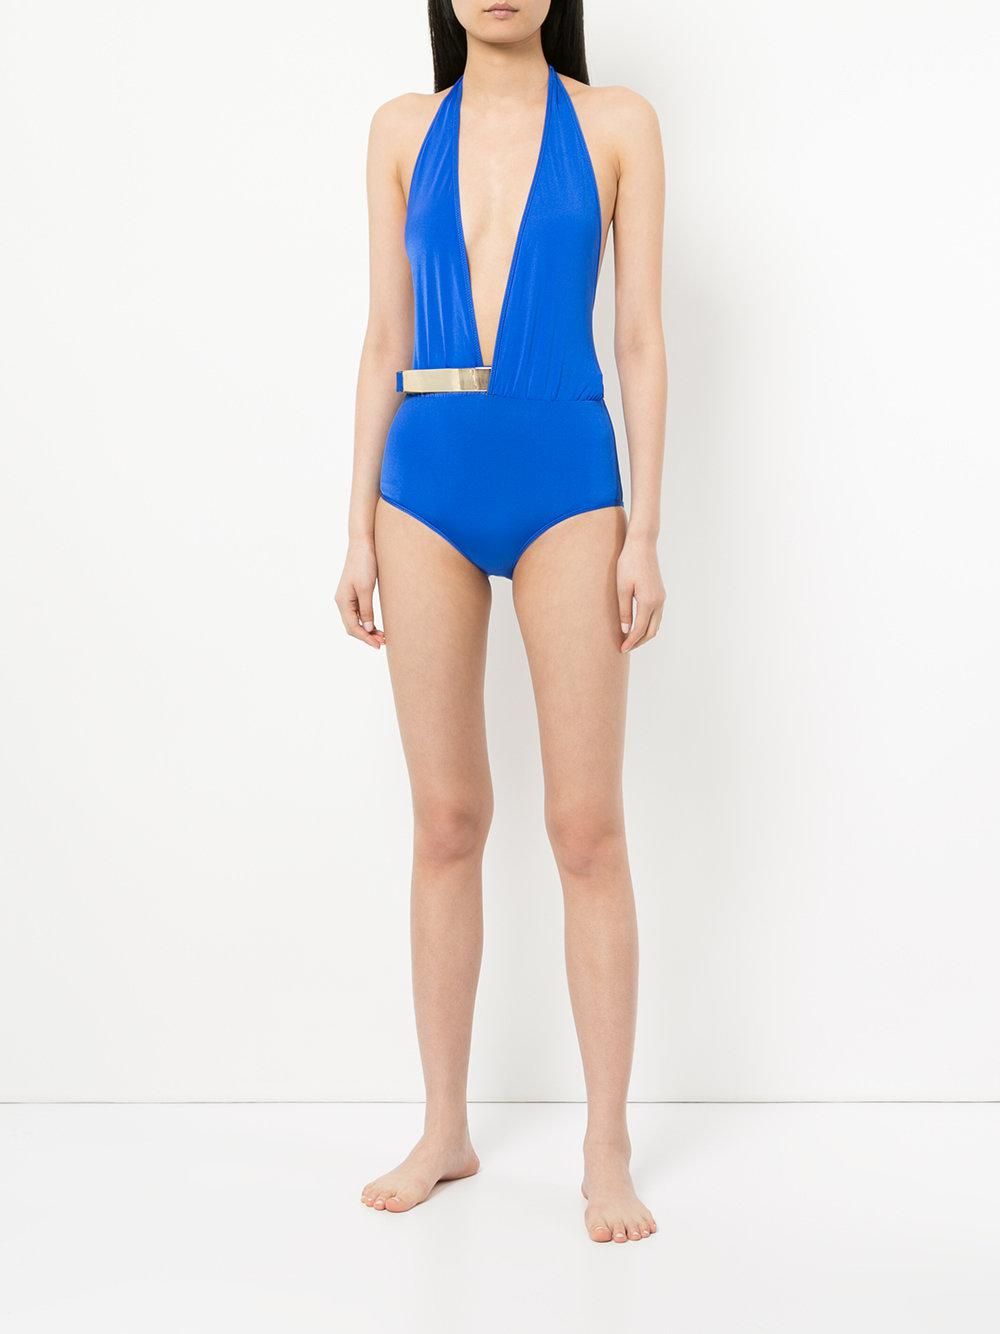 5d3a1b06decfb Moeva Bridget Swimsuit in Blue - Lyst